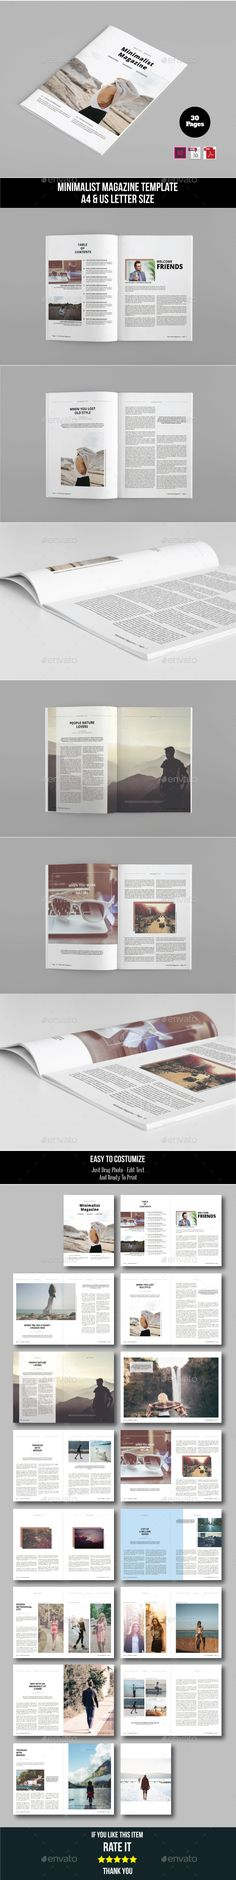 Minimal Magazine Template InDesign INDD. Download here: http://graphicriver.net/item/minimal-magazine-template/16348025?ref=ksioks